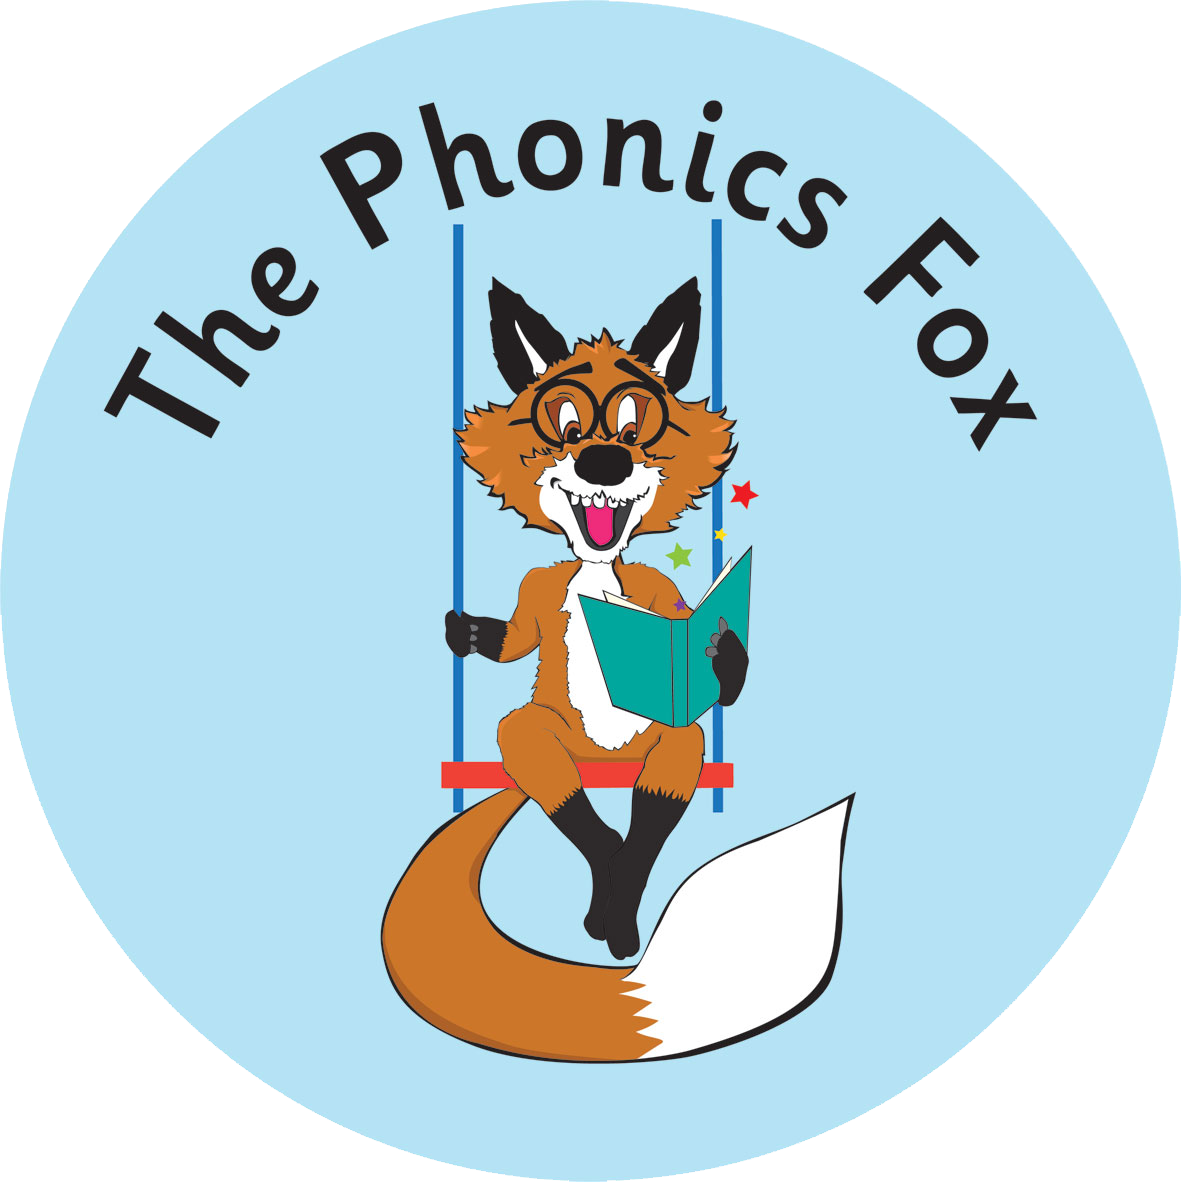 The Phonics Fox's logo